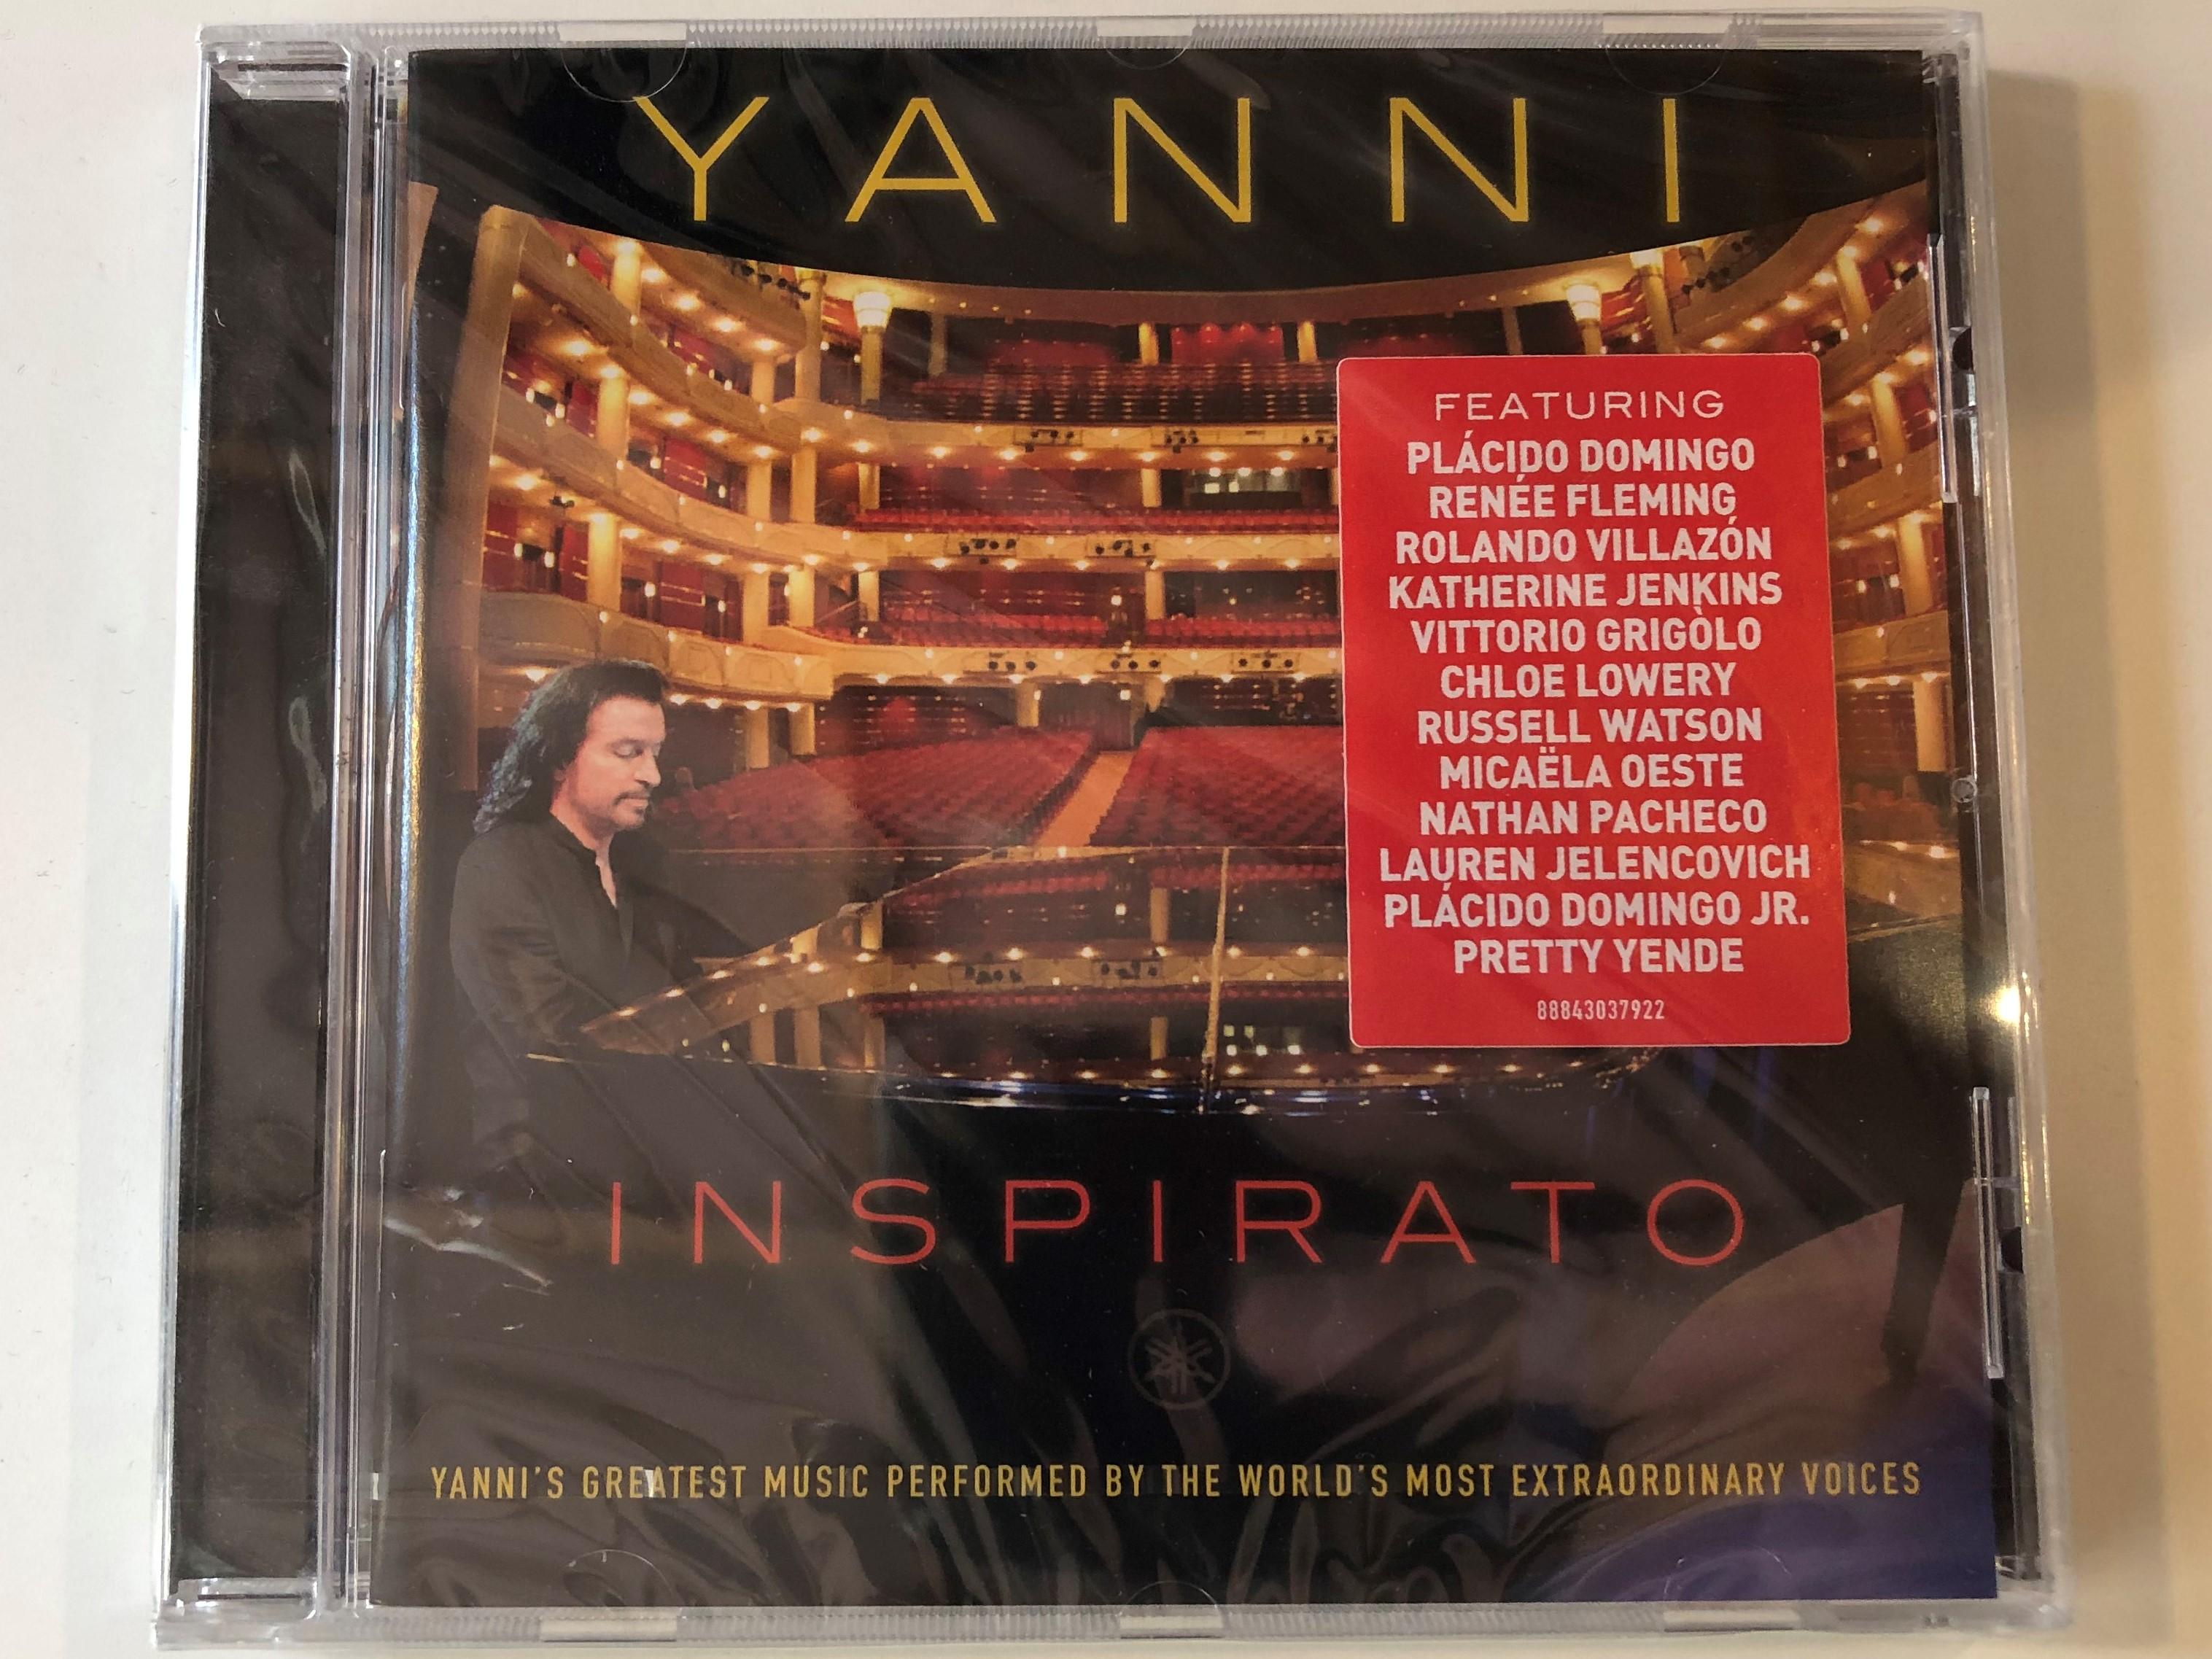 yanni-inspirato-yanni-s-greatest-music-performed-by-the-world-s-most-extraordinary-voices-featuring-placido-domingo-ren-e-fleming-rolando-villaz-n-katherine-jenkins-vittorio-grigolo-...-y-1-.jpg